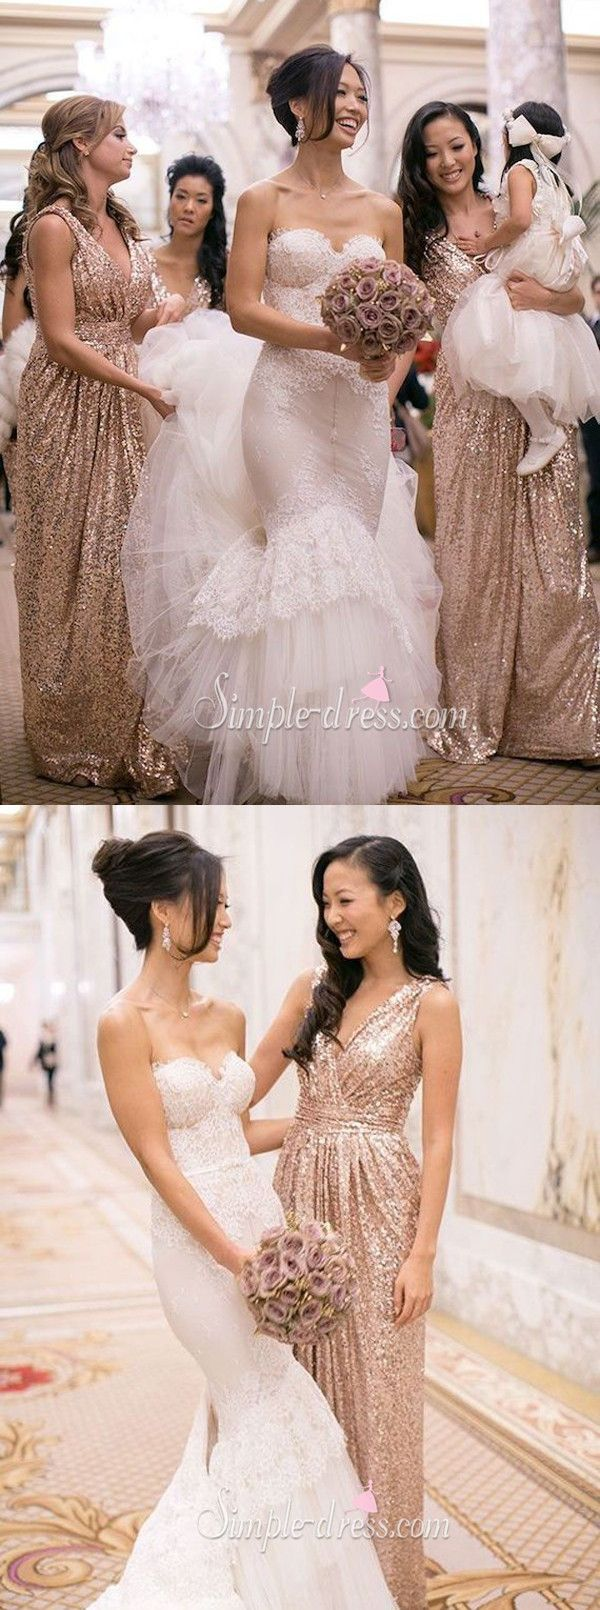 2016 bridesmaid dresses, long bridesmaid dresses, sequined bridesmaid dresses, v-neck bridesmaid dresses